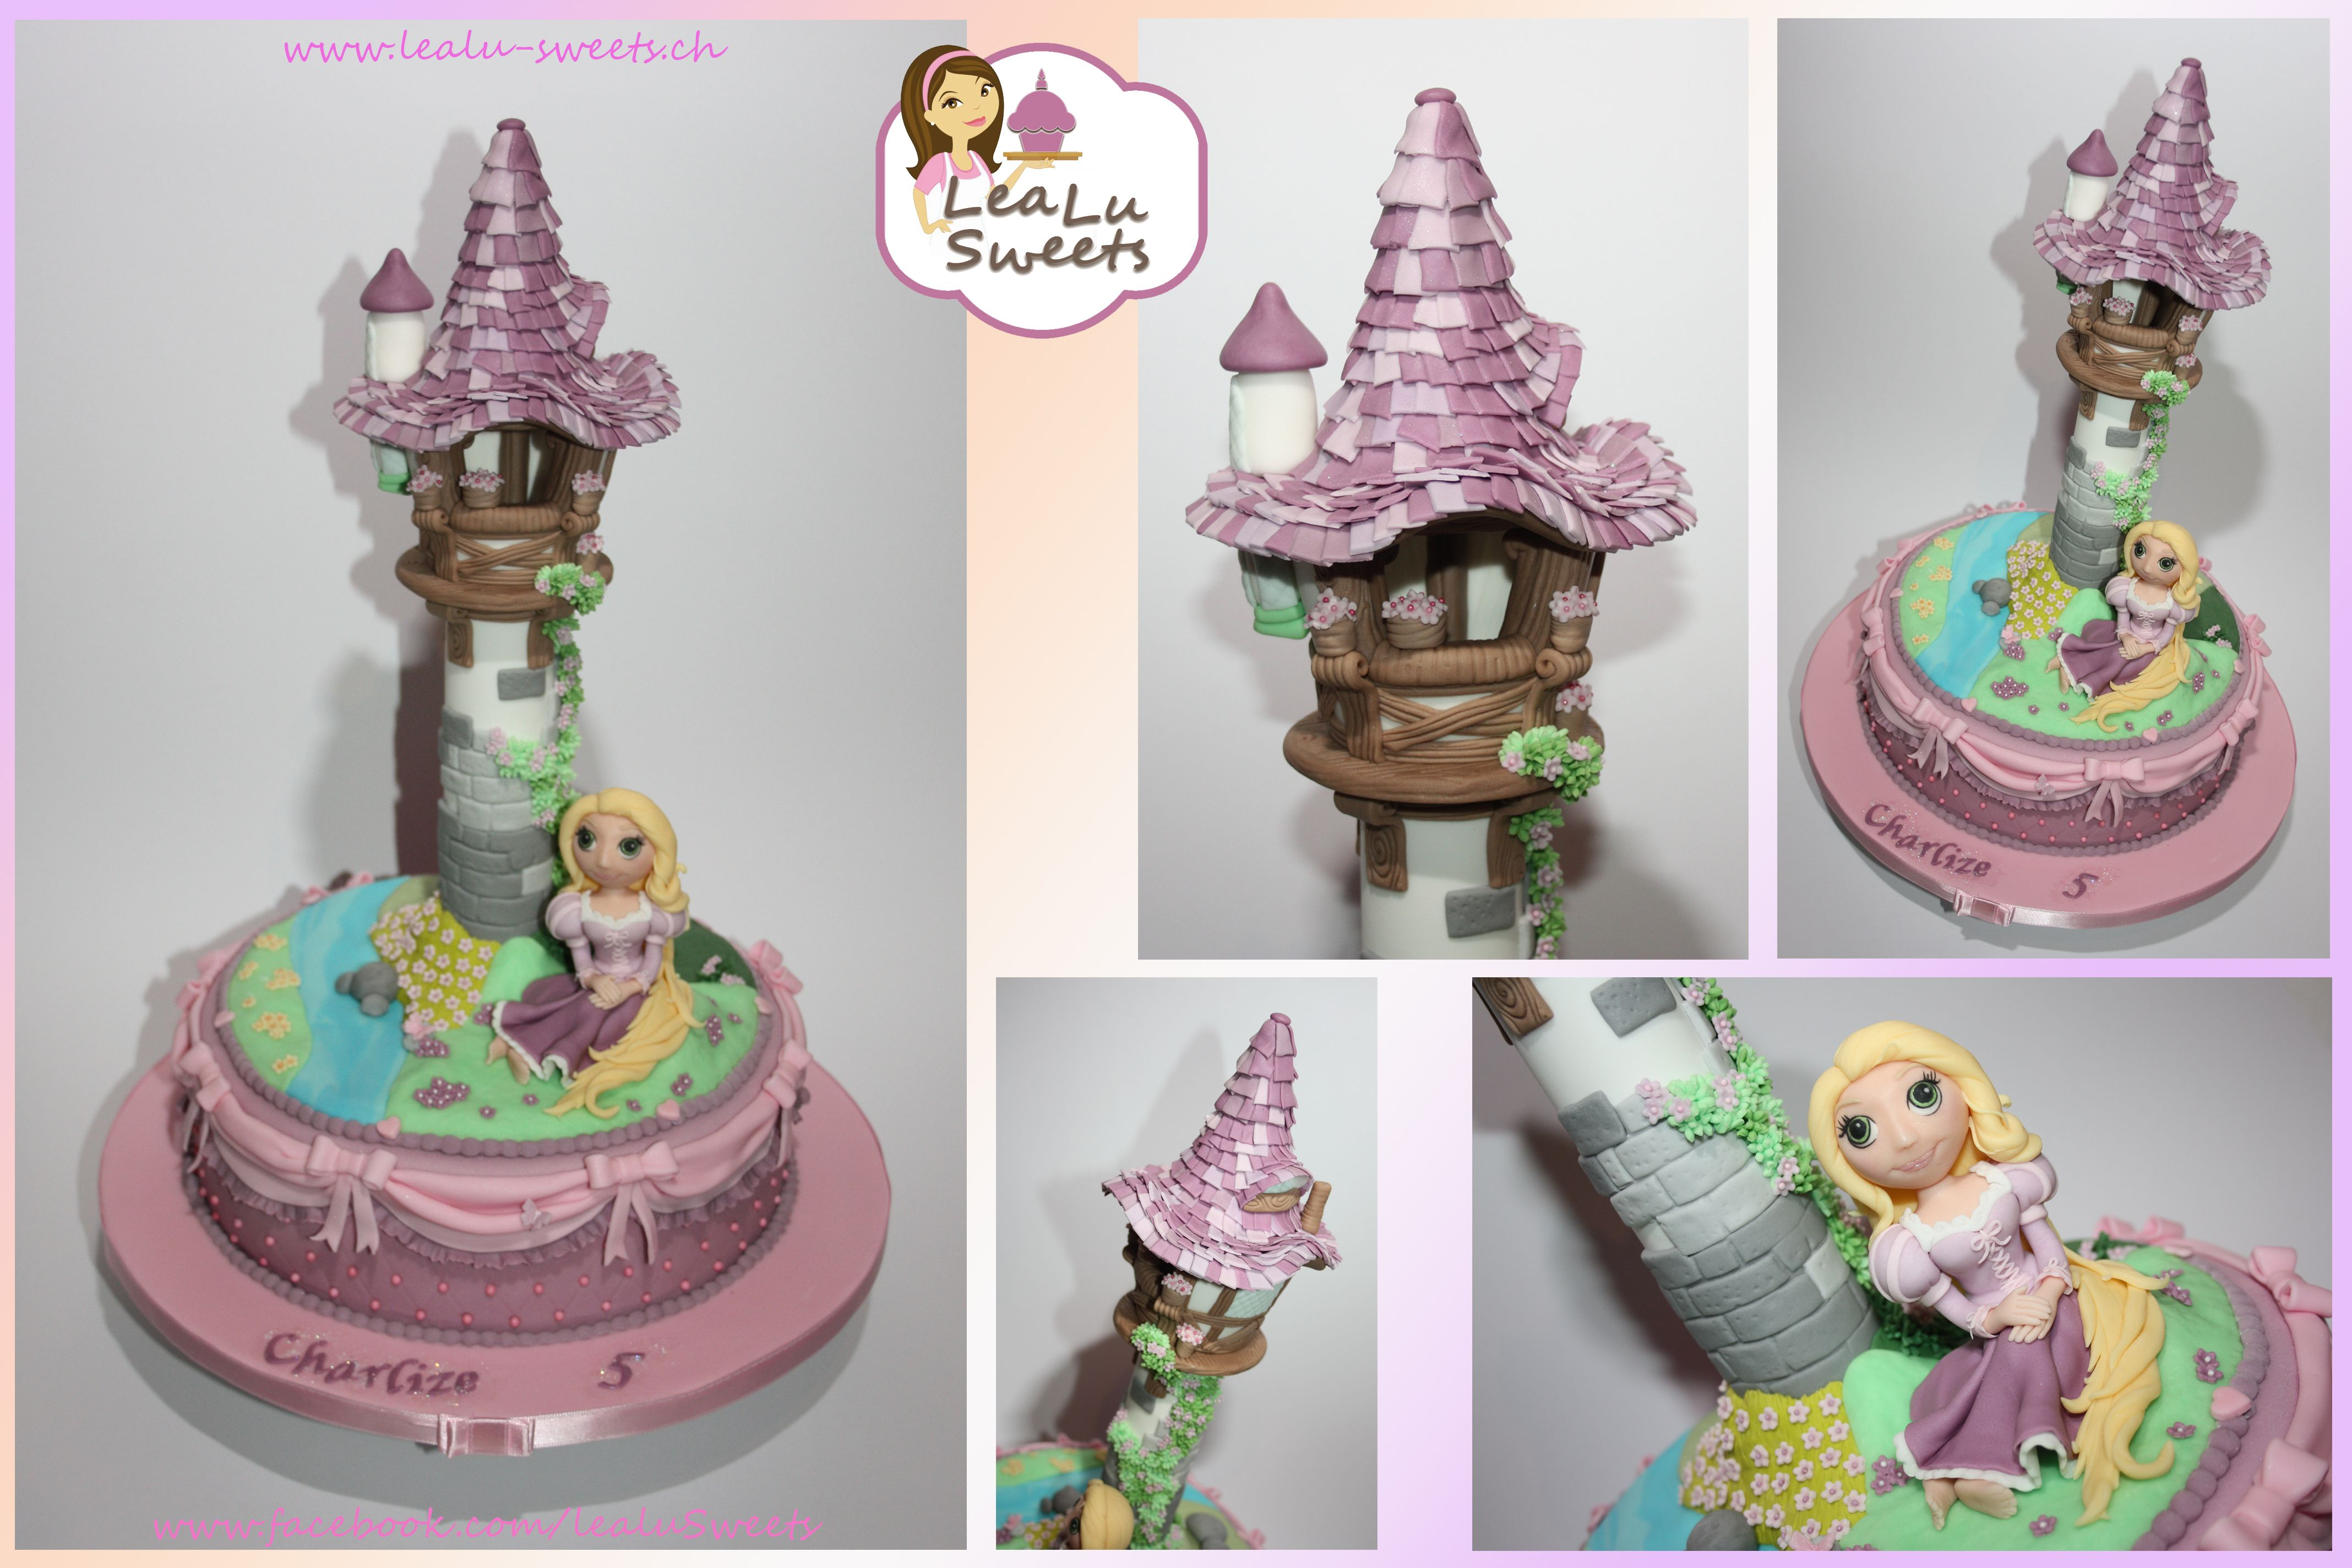 rapunzel torte tangled cake by lealu sweets lealu sweets cakes pinterest sweet cakes and. Black Bedroom Furniture Sets. Home Design Ideas